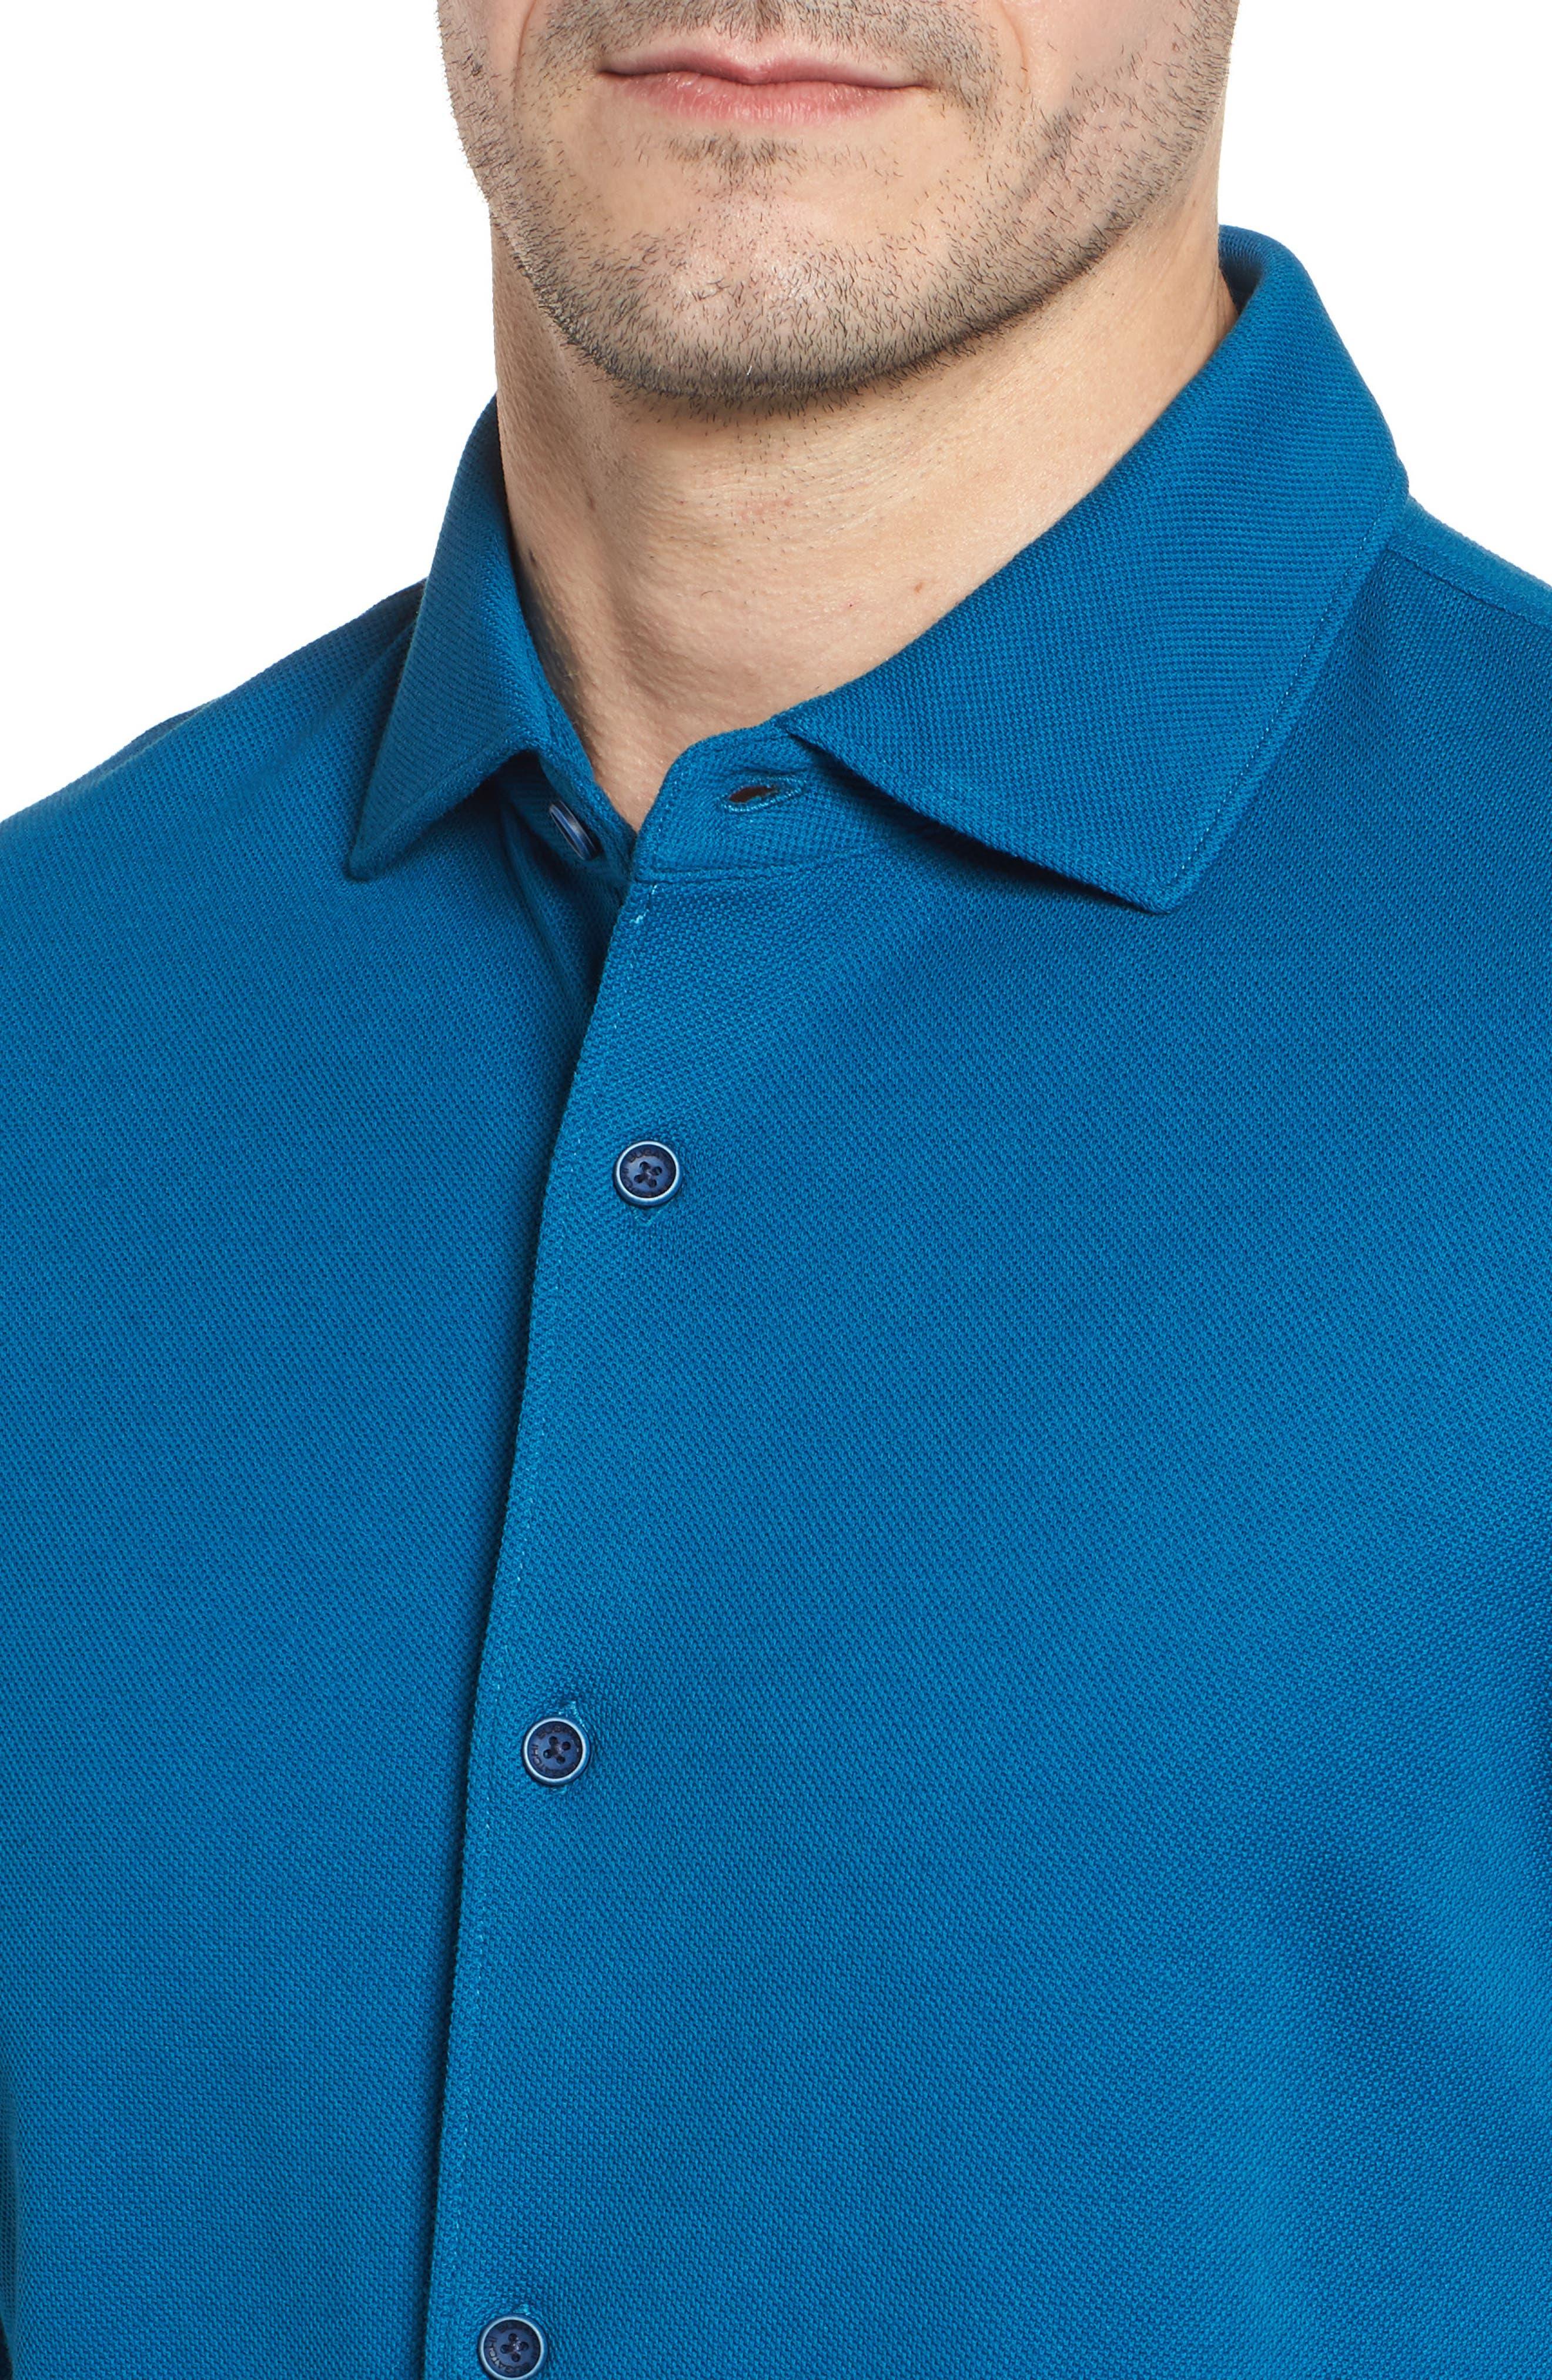 Regular Fit Knit Sport Shirt,                             Alternate thumbnail 4, color,                             Teal